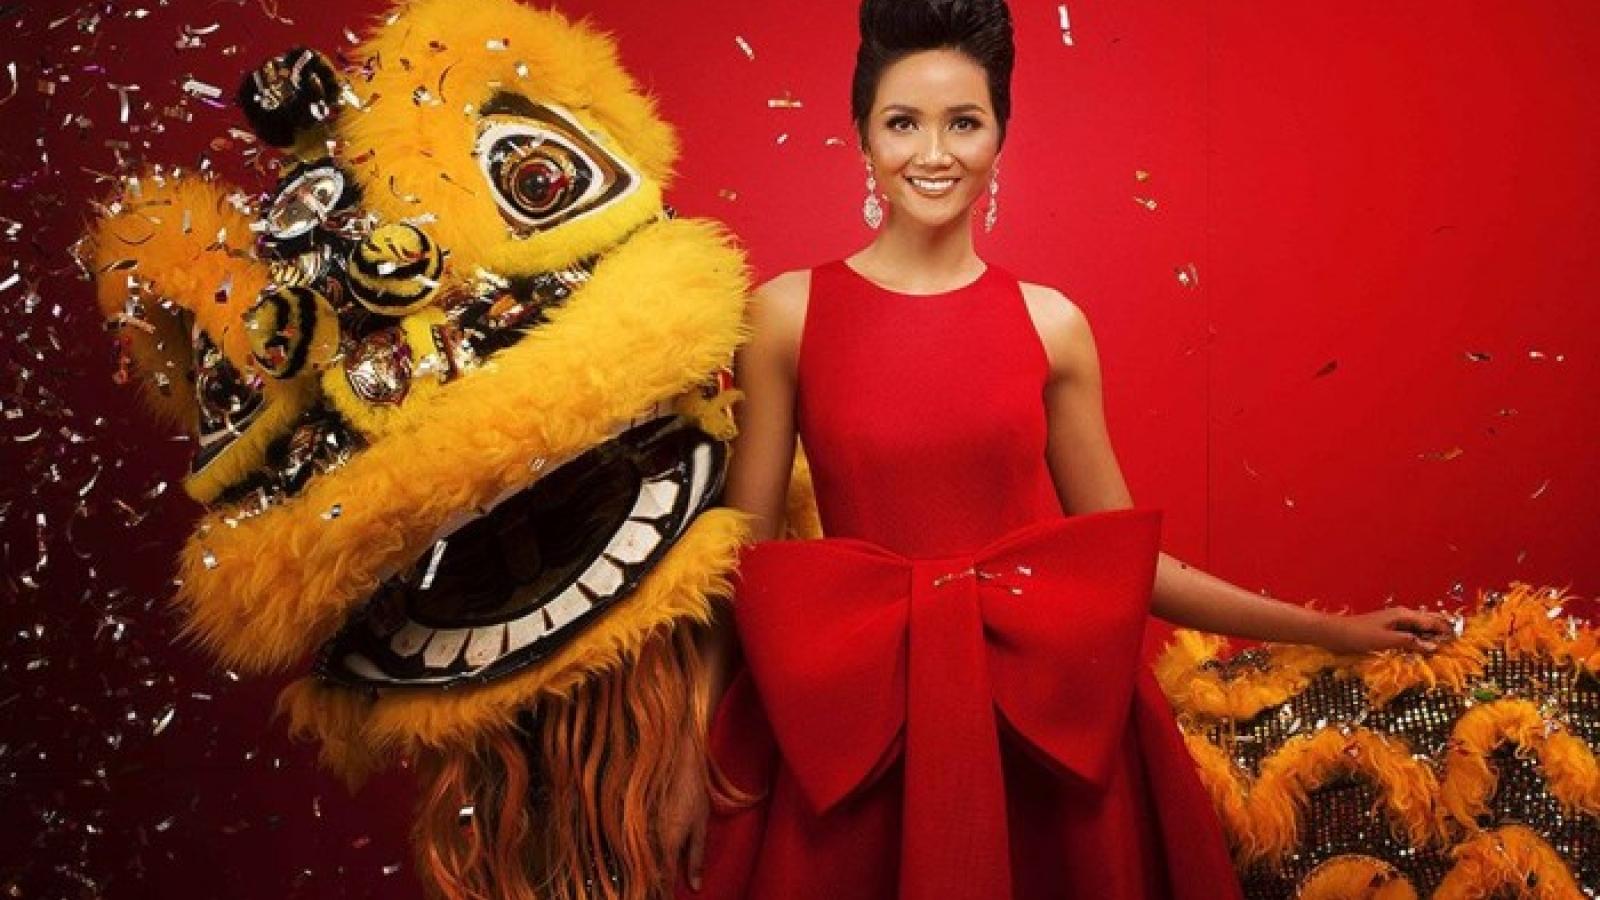 H'Hen Nie achieves Top 8 finish in Miss Grand Slam 2018